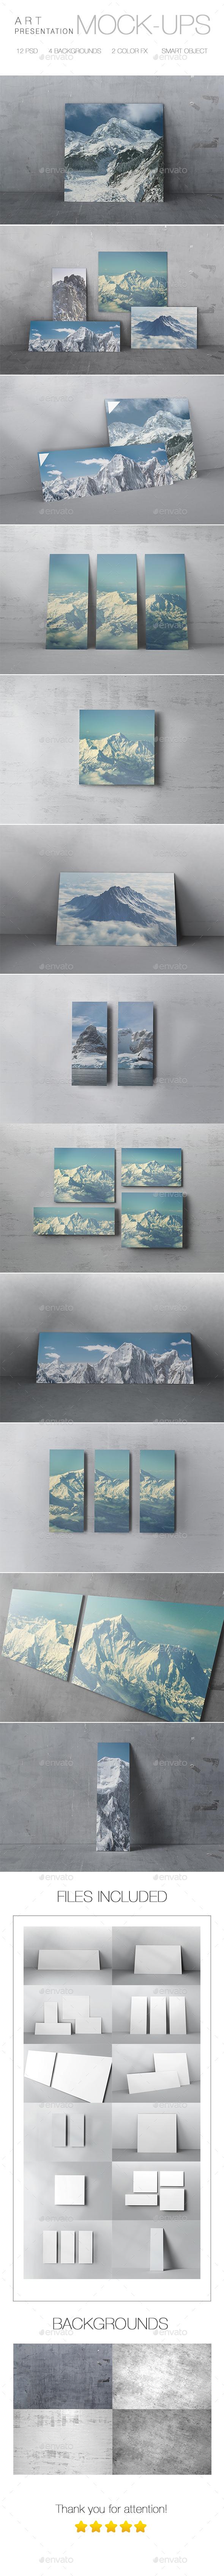 Presentation Art Mock-up - Product Mock-Ups Graphics